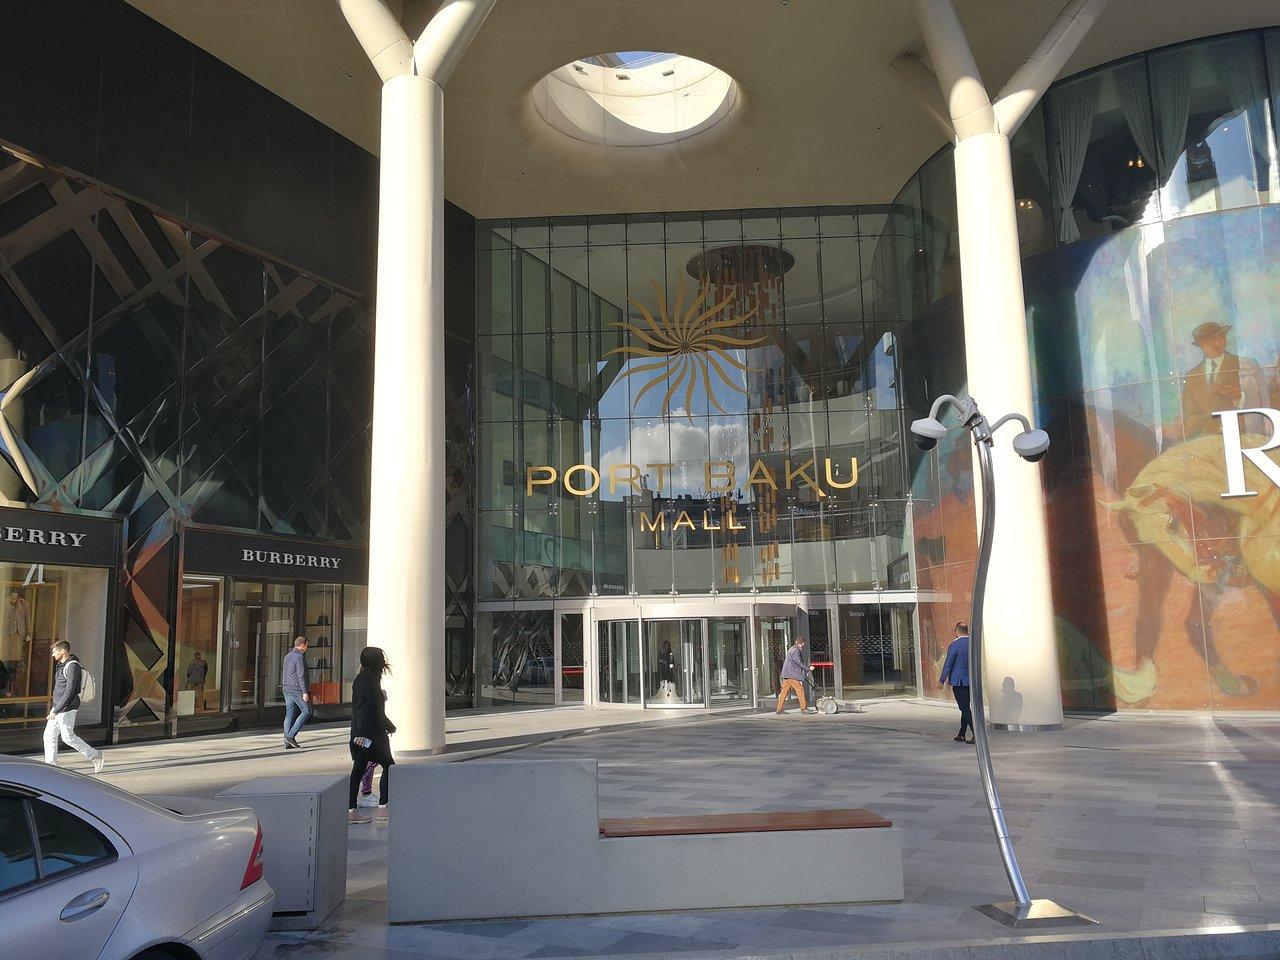 Port Baku Mall 2021 All You Need To Know Before You Go With Photos Tripadvisor